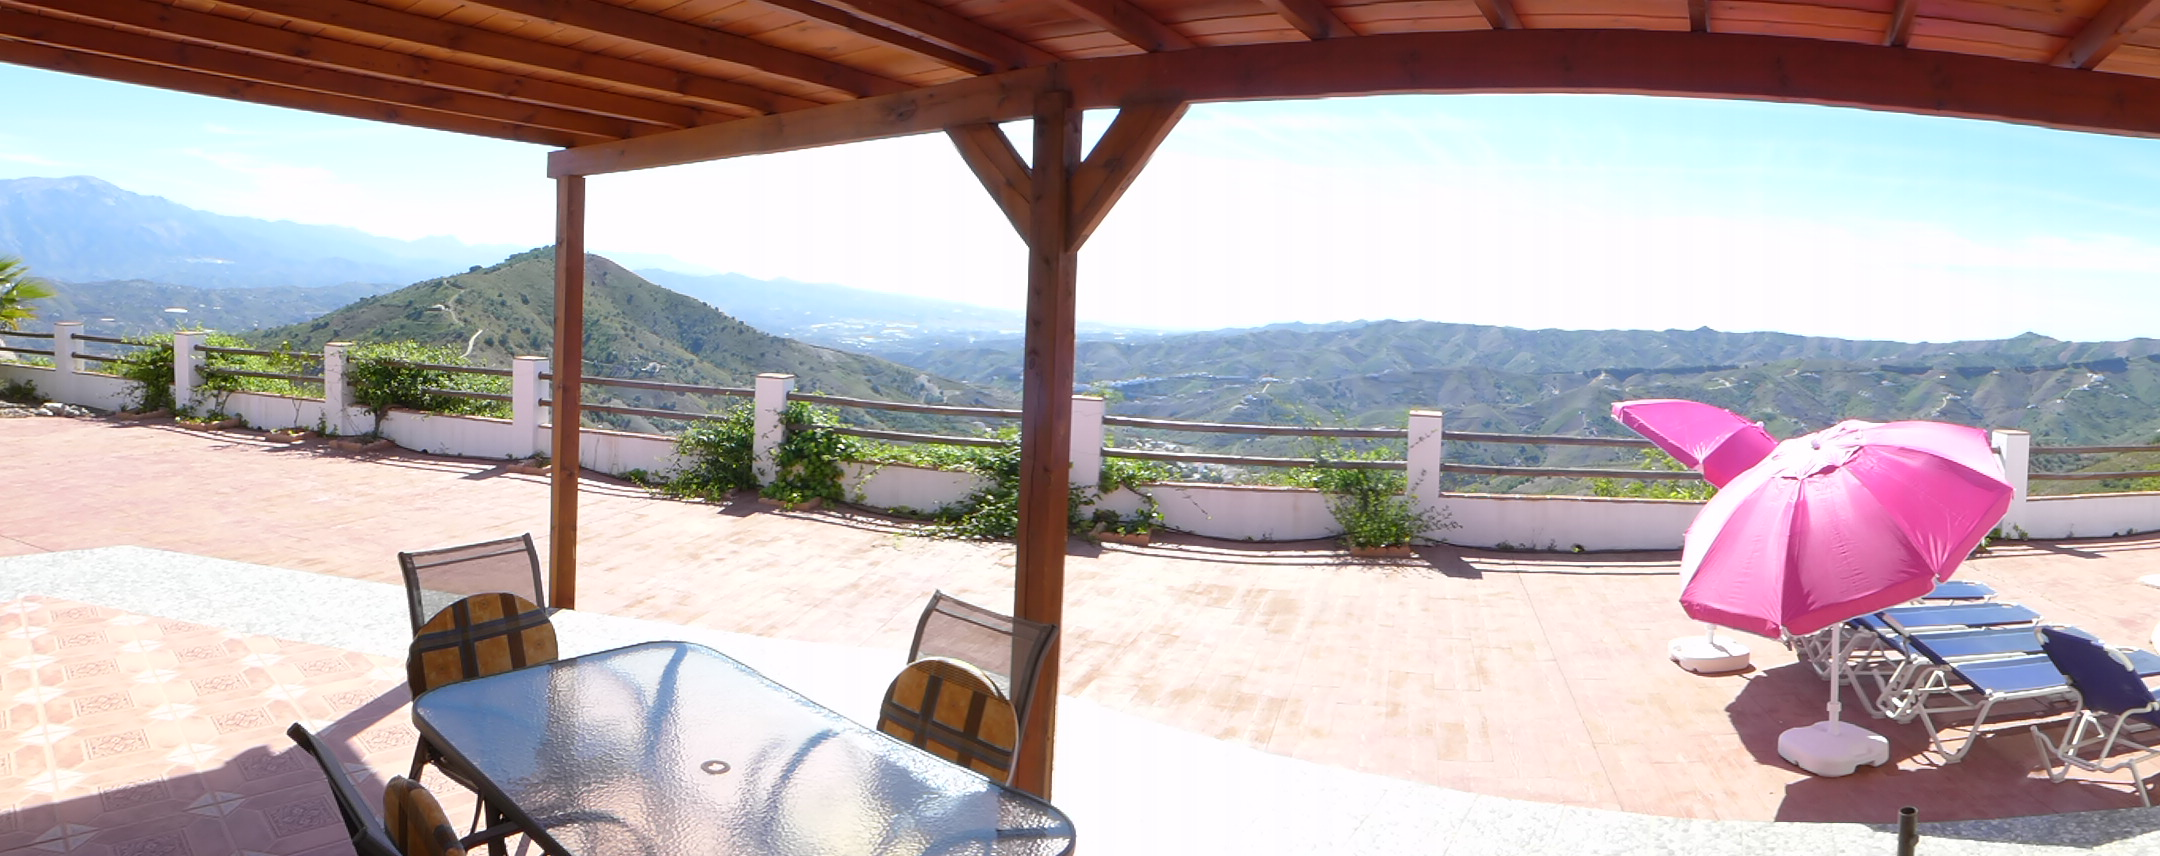 vakantiehuis-andalusie-privacy-zwembad-zuid-spanje